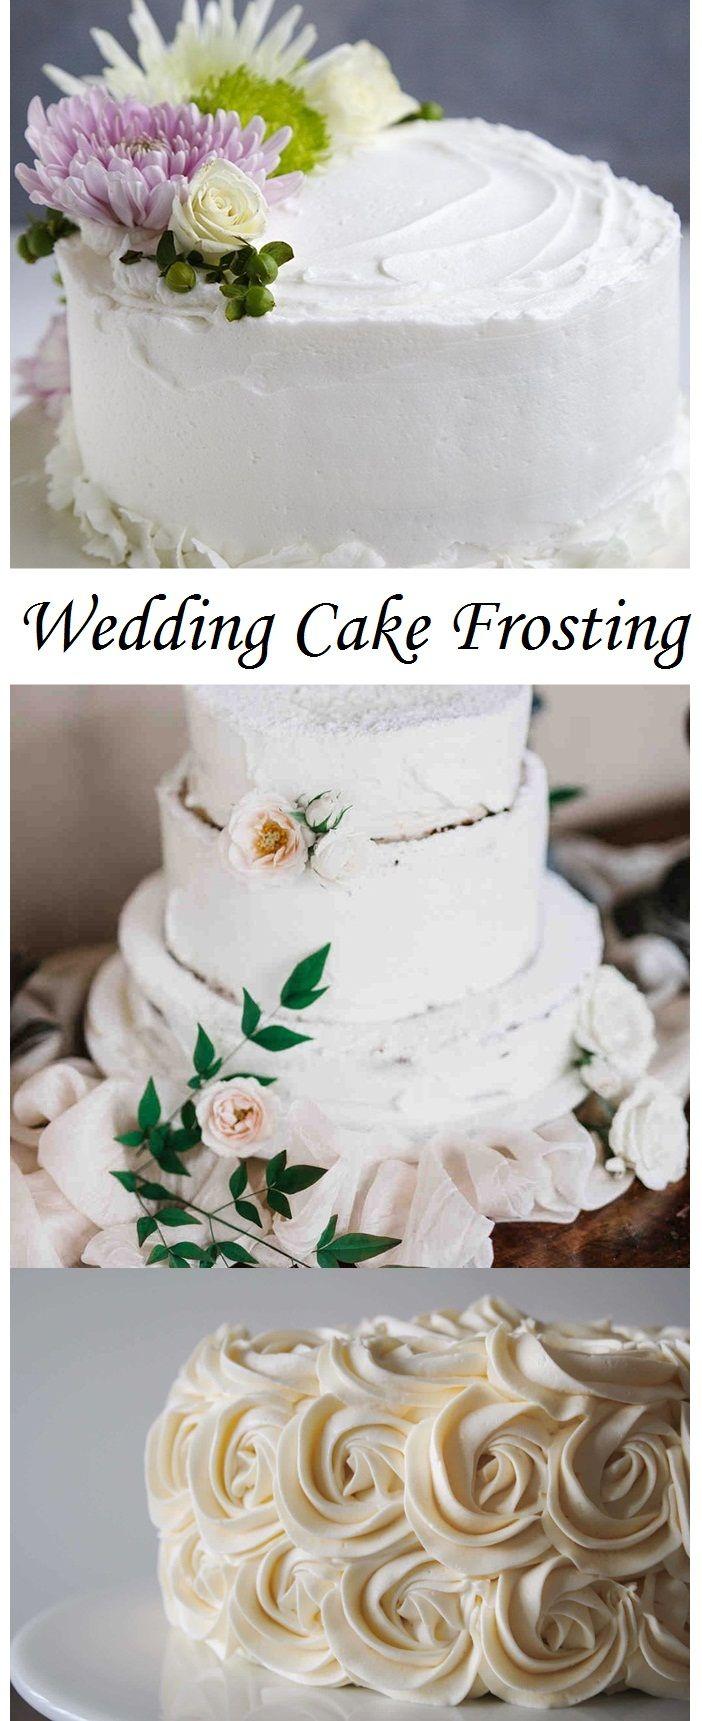 Wedding Cake Frosting Wedding Cake Frosting Wedding Cake Frosting Recipe Wedding Cake Icing